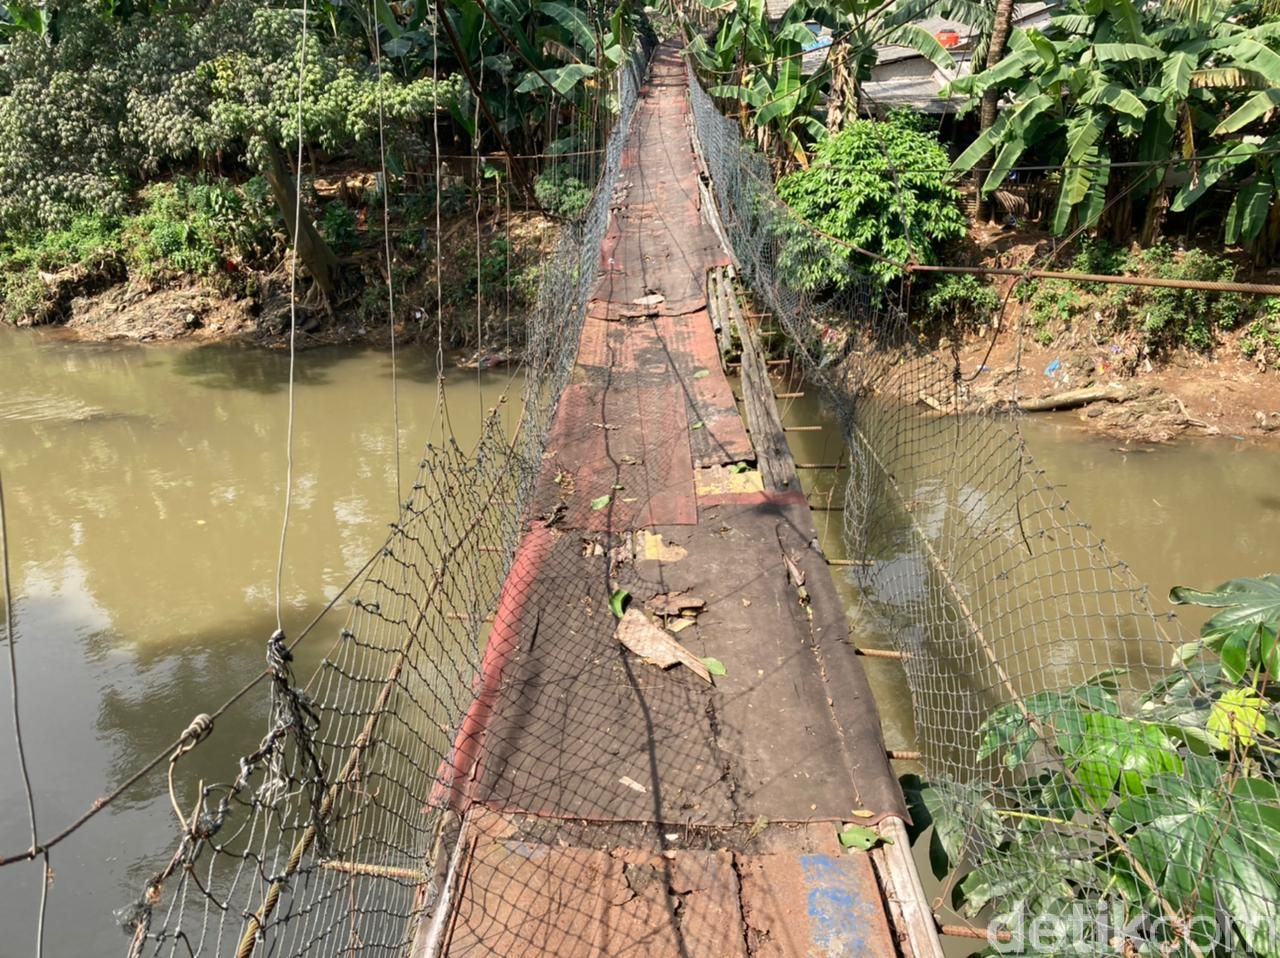 Jembatan gantung bak film 'Indiana Jones' di Srengseng Sawah Jaksel-Depok, 16 Juni 2021. (Annisa Rizky Fadhila/detikcom)